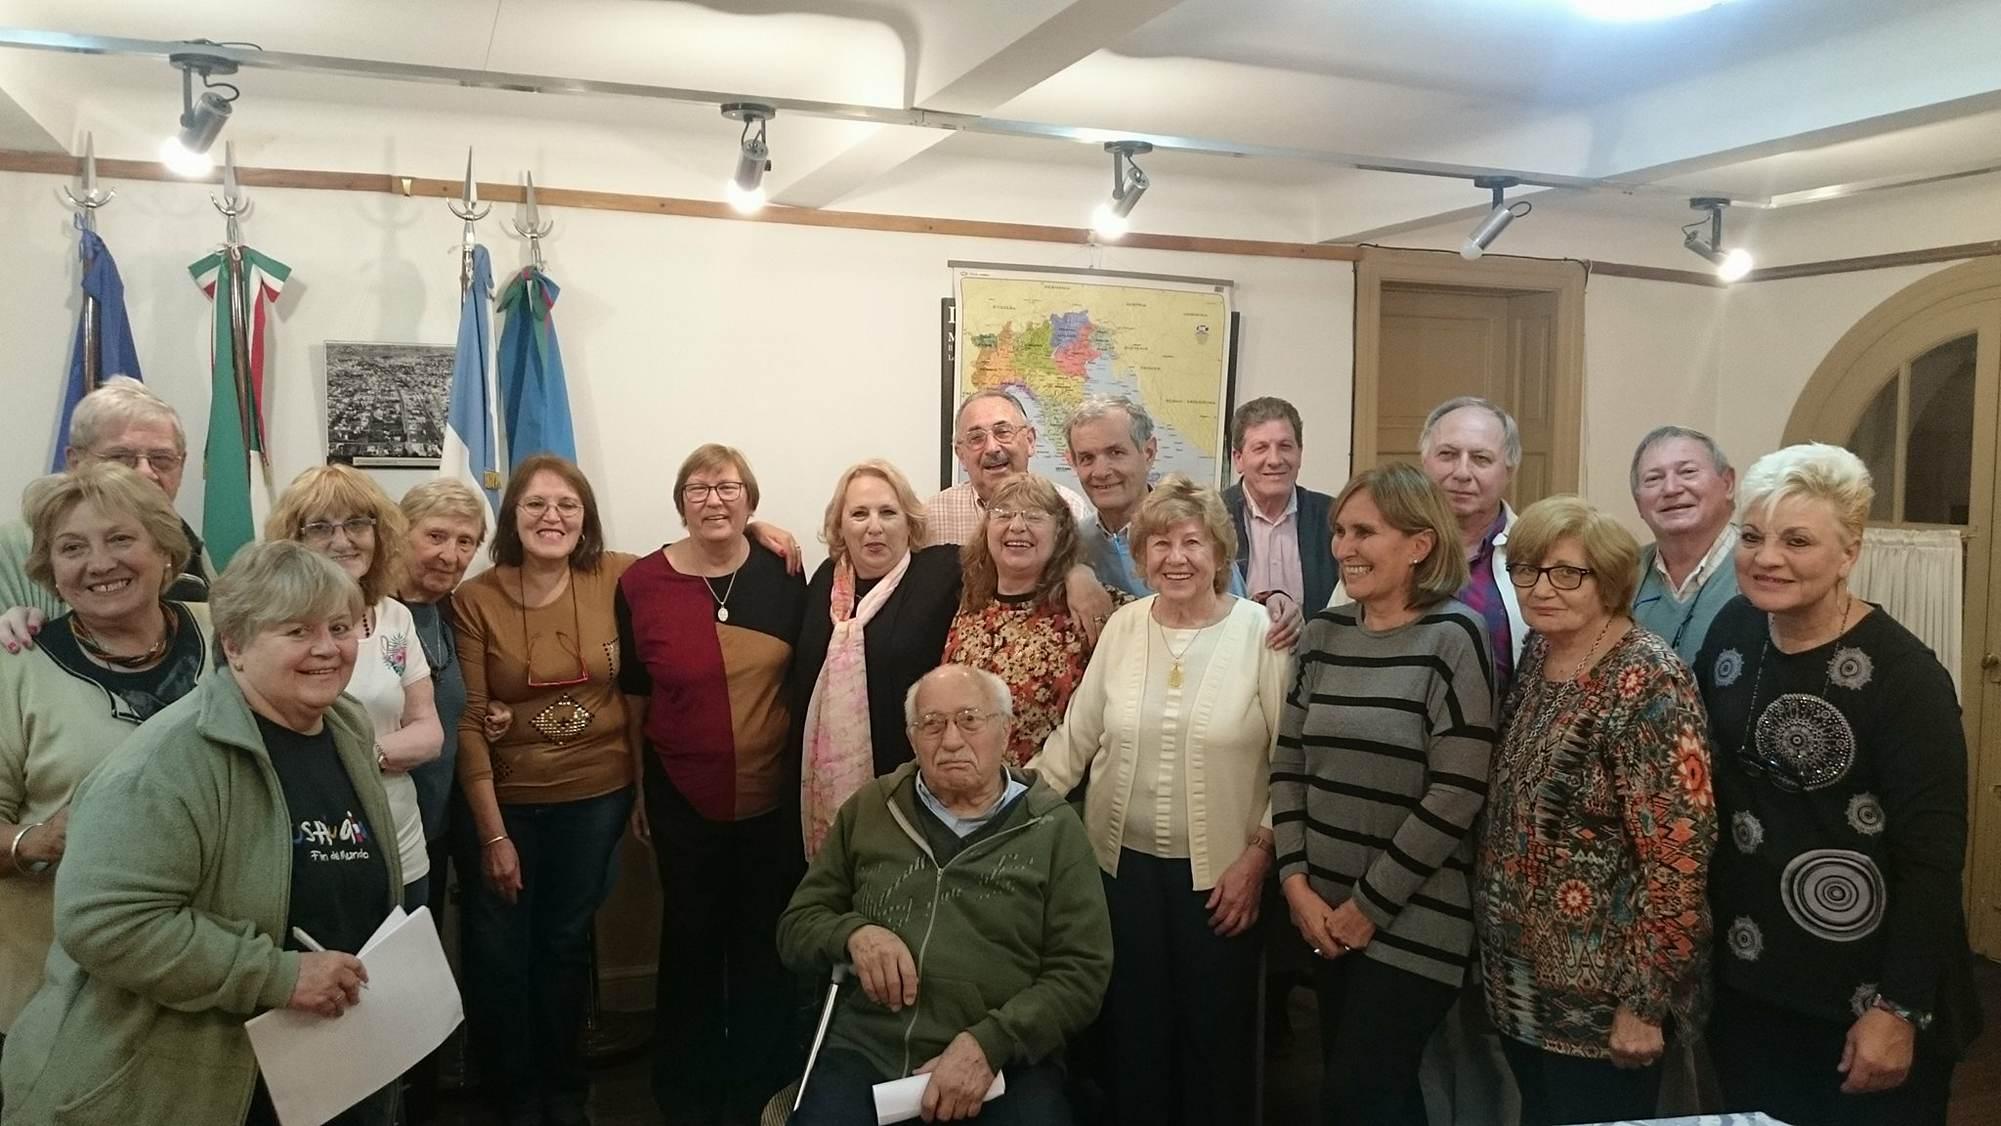 L'ENITAS ha la sua sede Sociale a Lomas de Zamora. Bianca Amici. ENITAS Lomas de Zamora